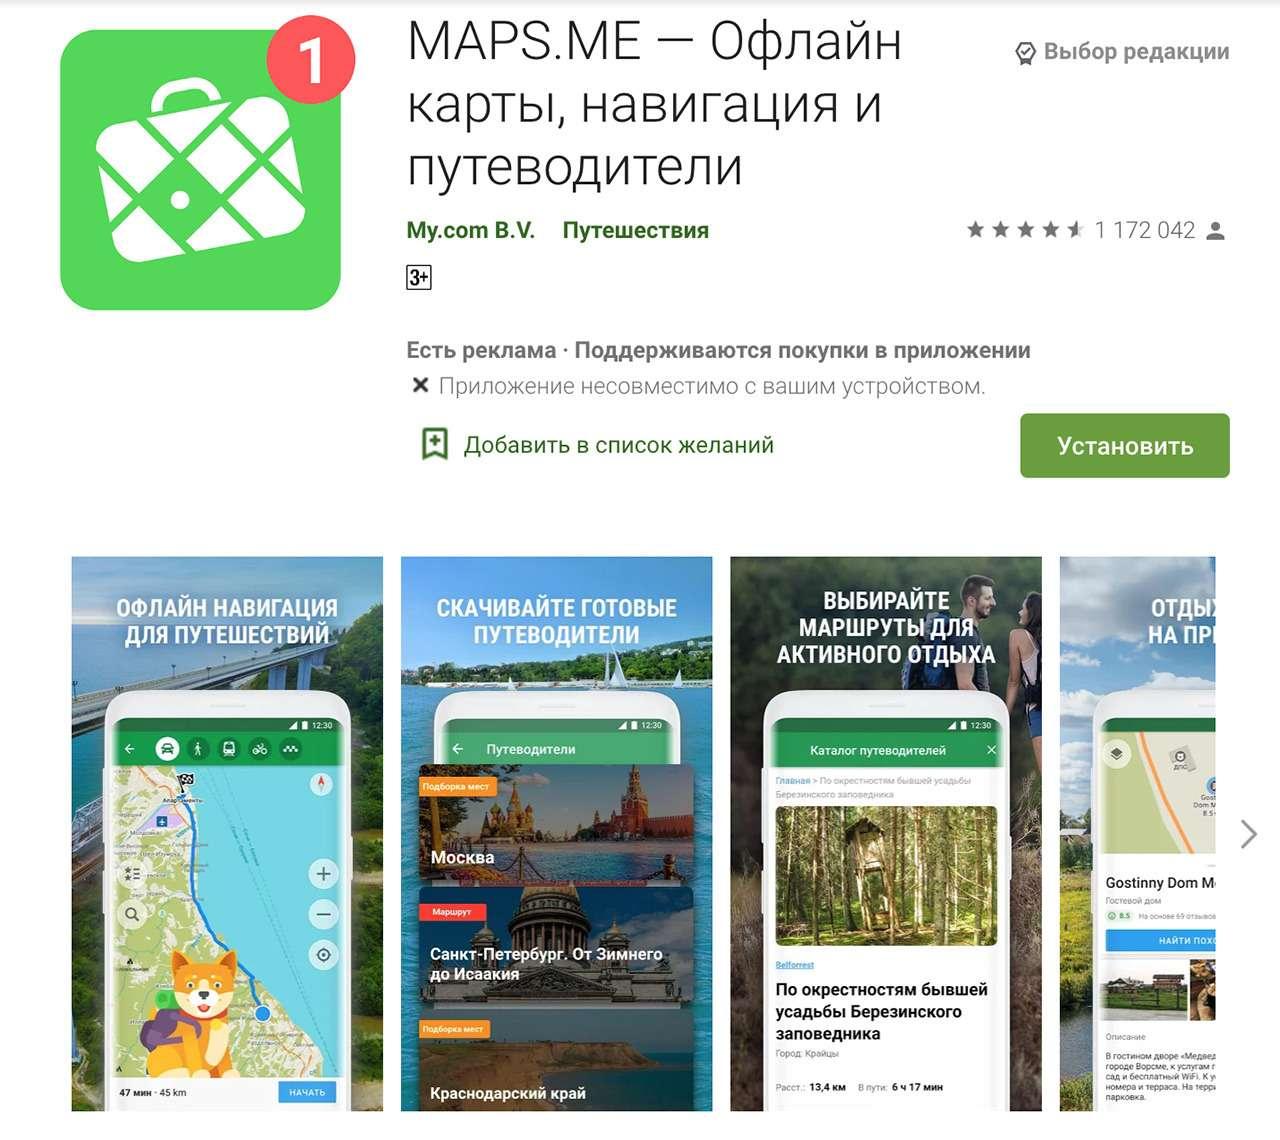 6 альтернатив Яндекс.Навигатору. Выберите свою— фото 1195244